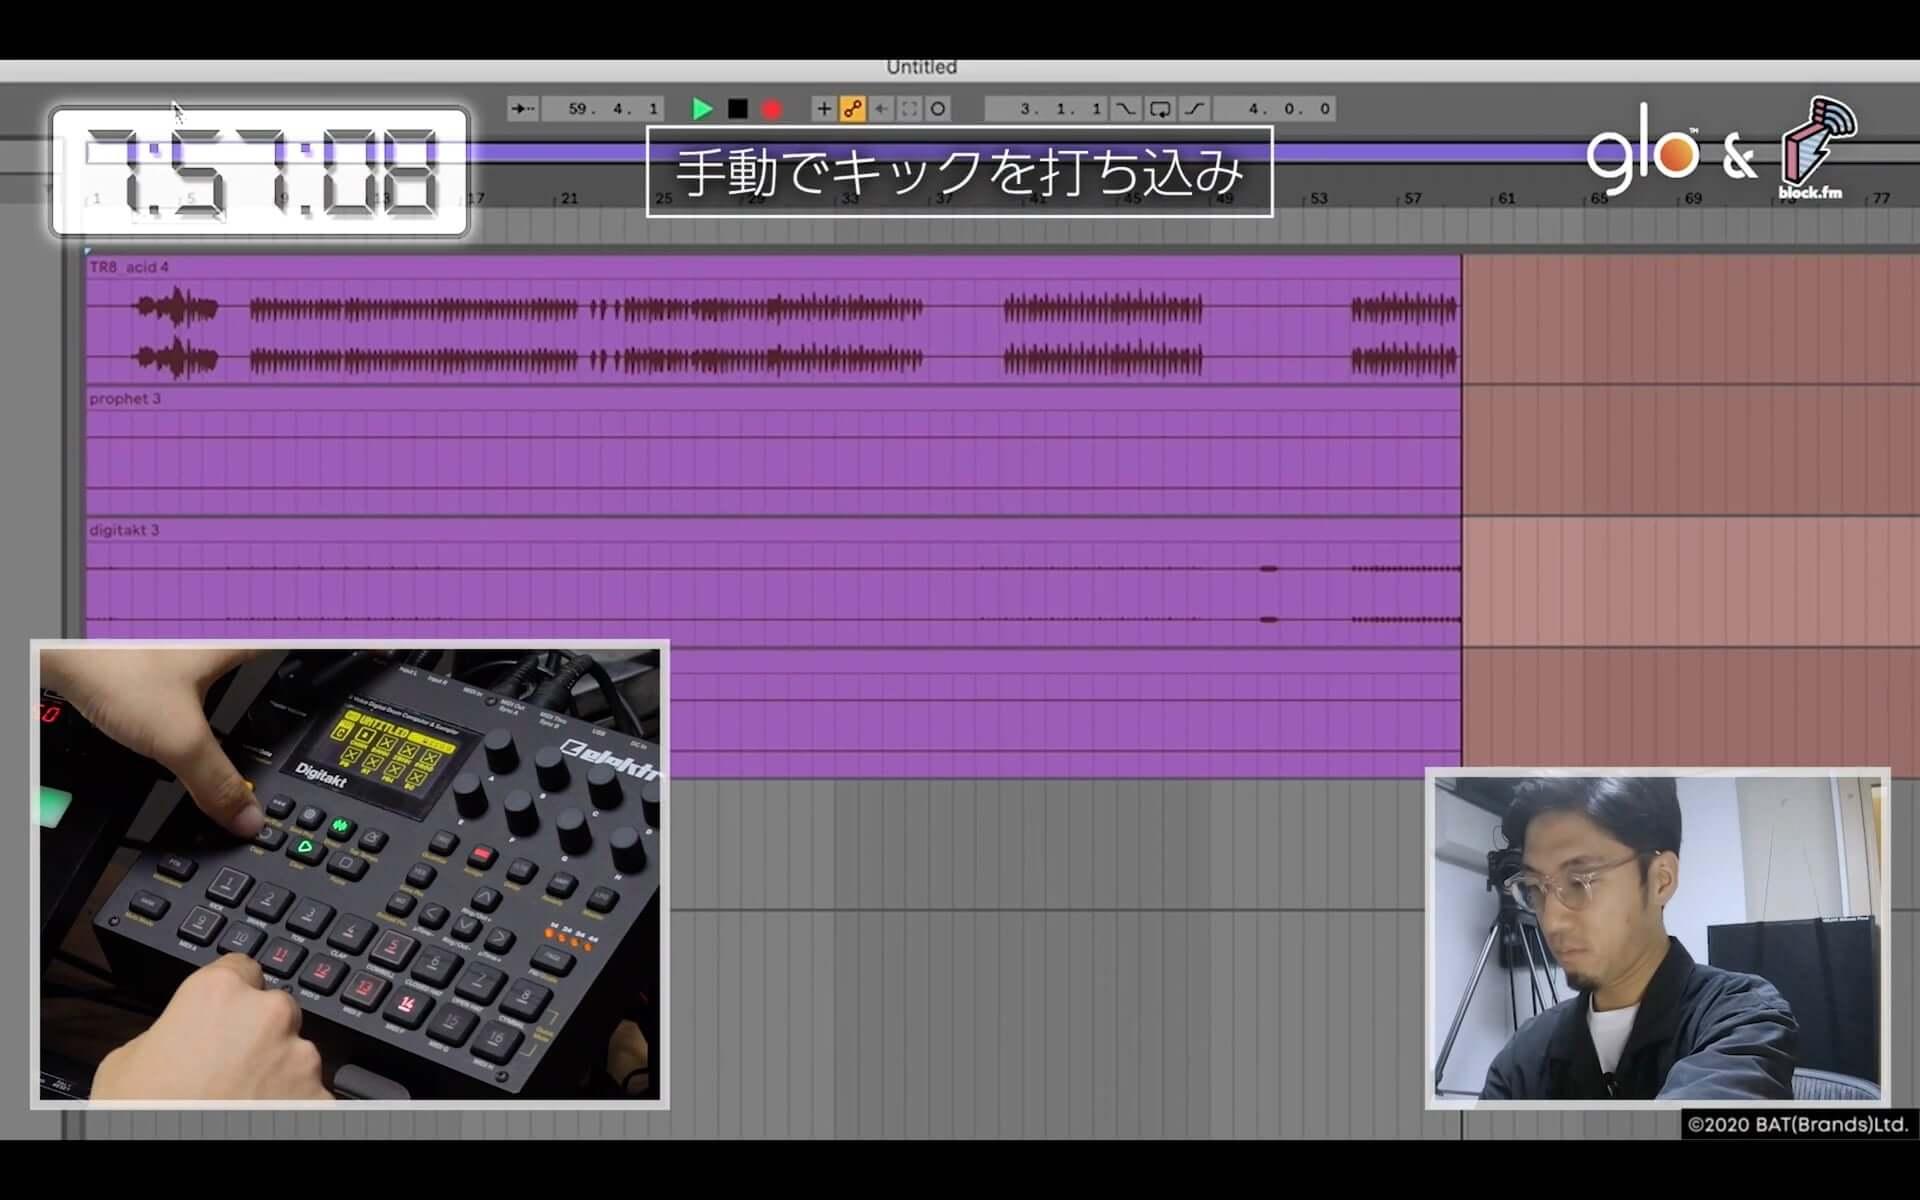 Seiho、tofubeats、Yamato、☆Taku Takahashiが様々なお題に挑戦!glo™とblock.fmが贈る動画シリーズが公開 music200916_glo-blockfm_11-1920x1200